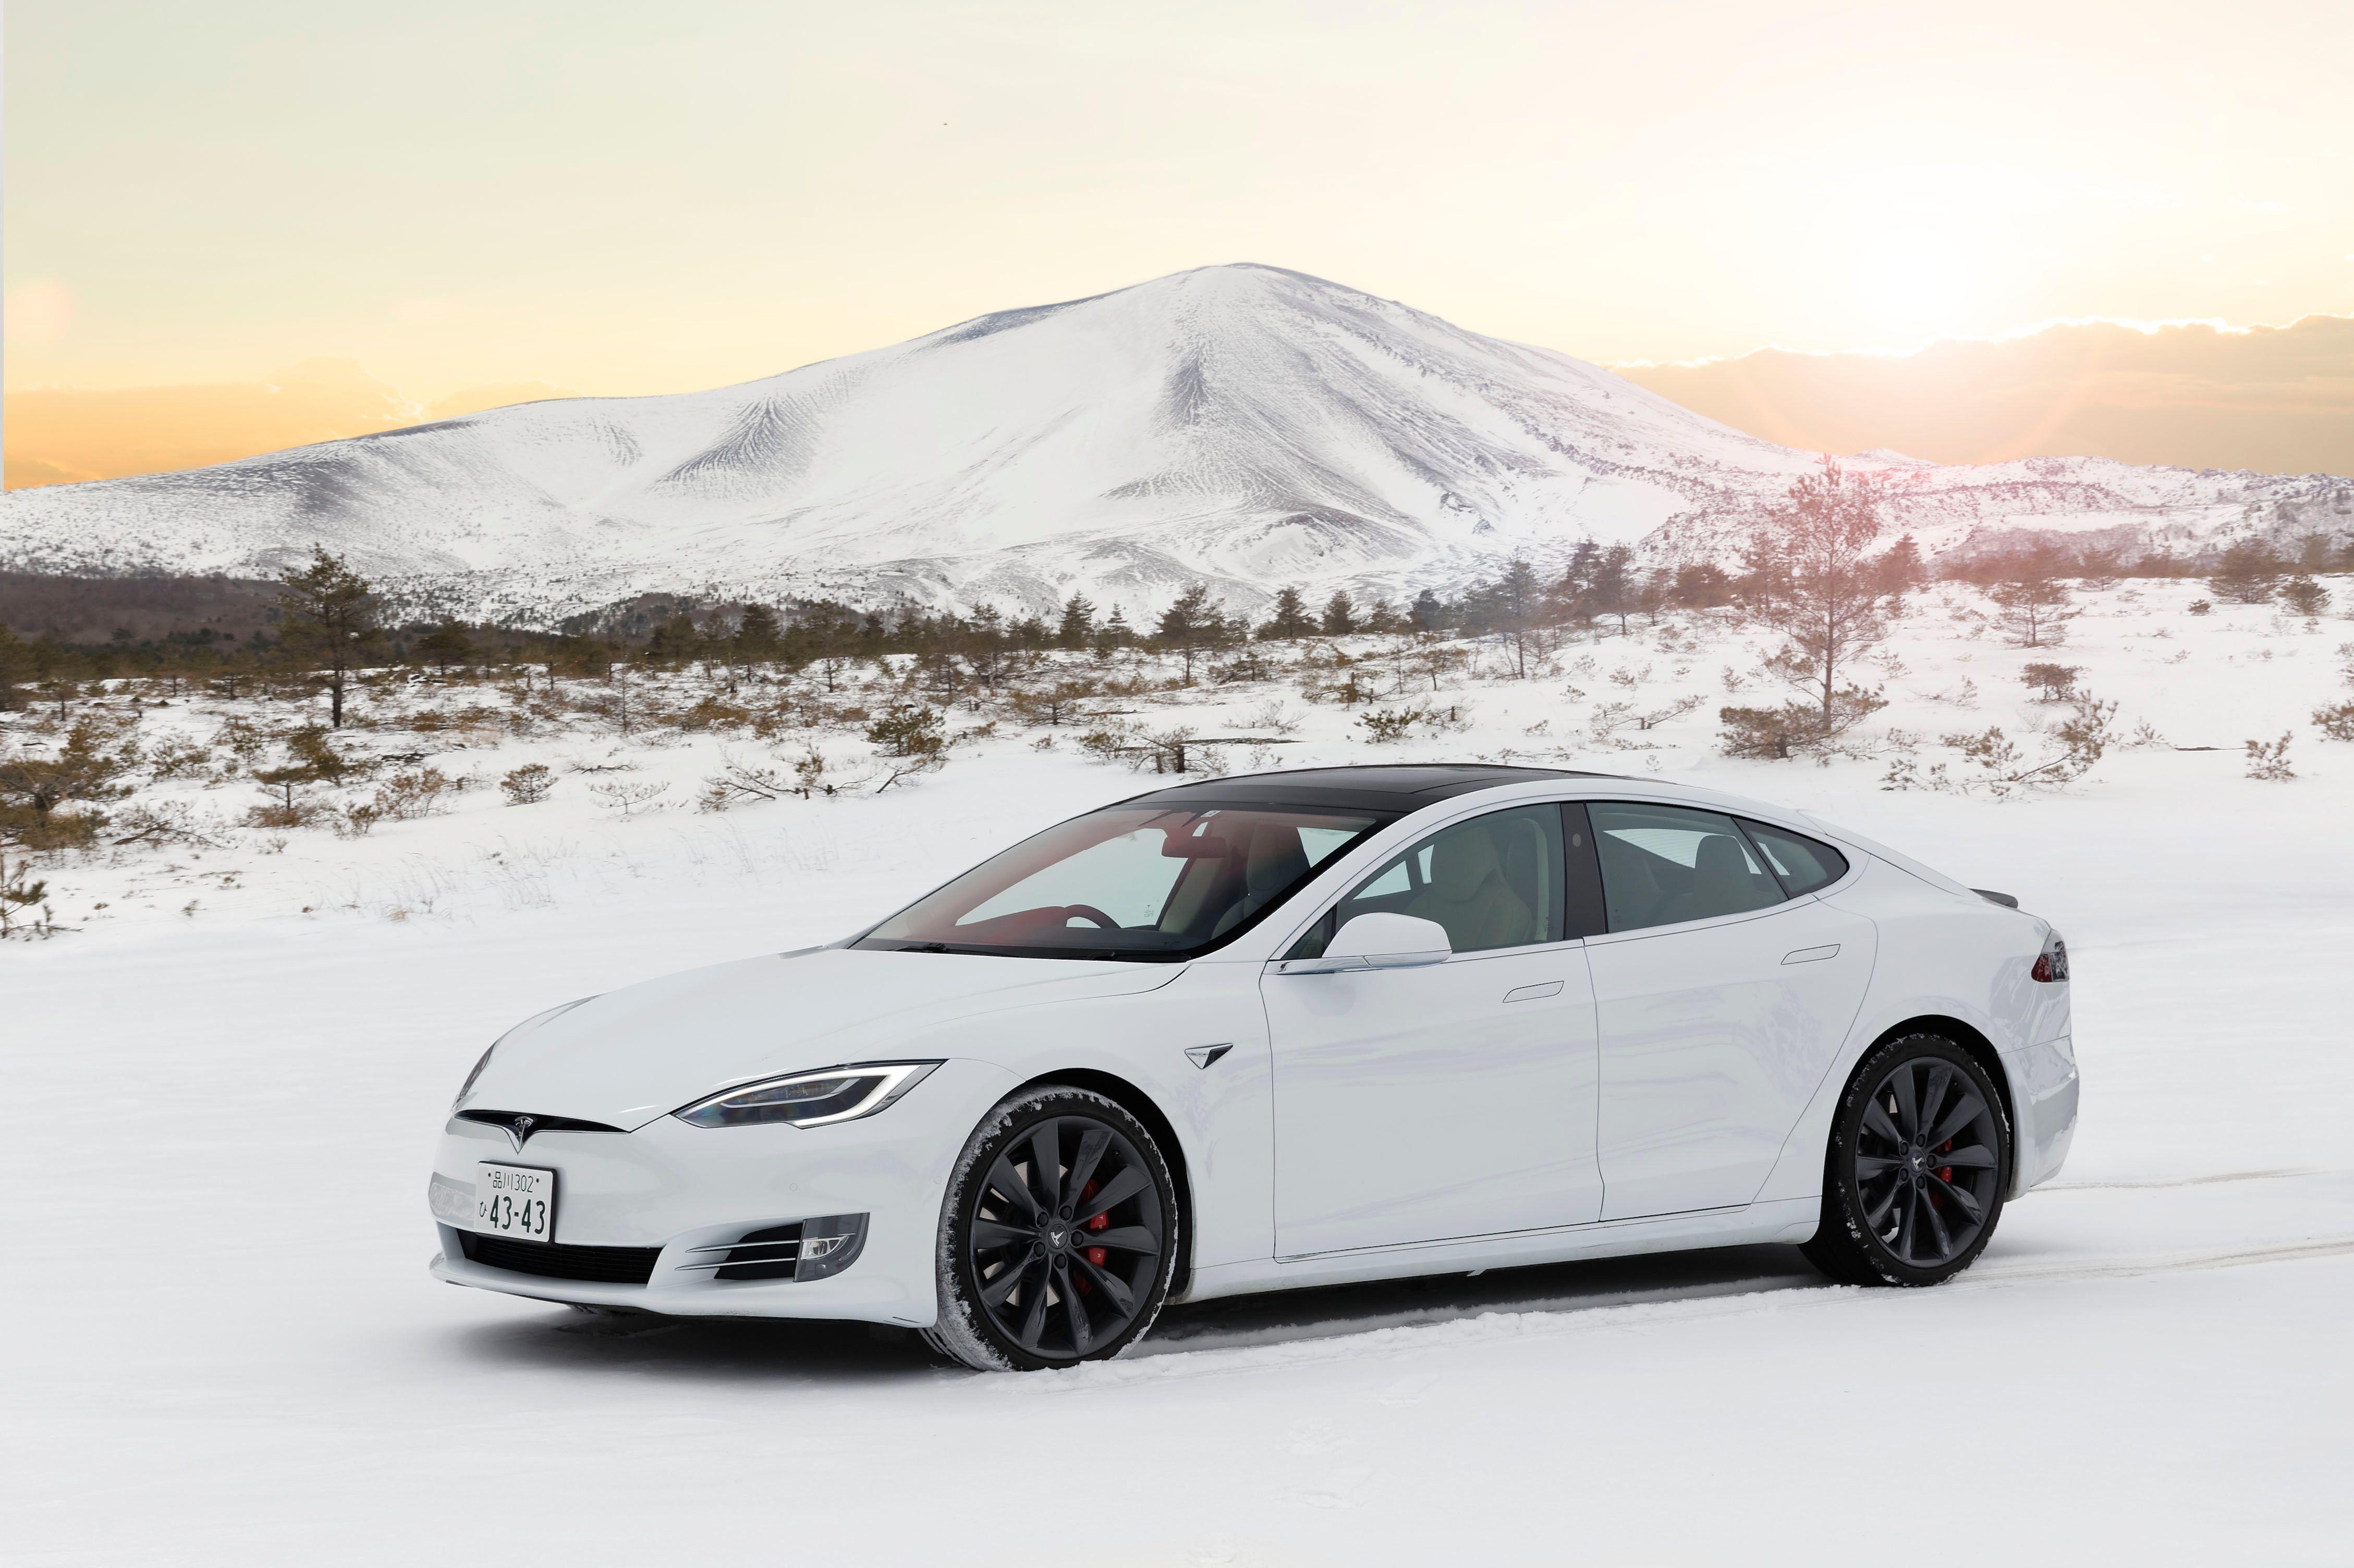 TESLA MODEL S Tesla Models Ev Automotive Car Automobile - Automobil tesla